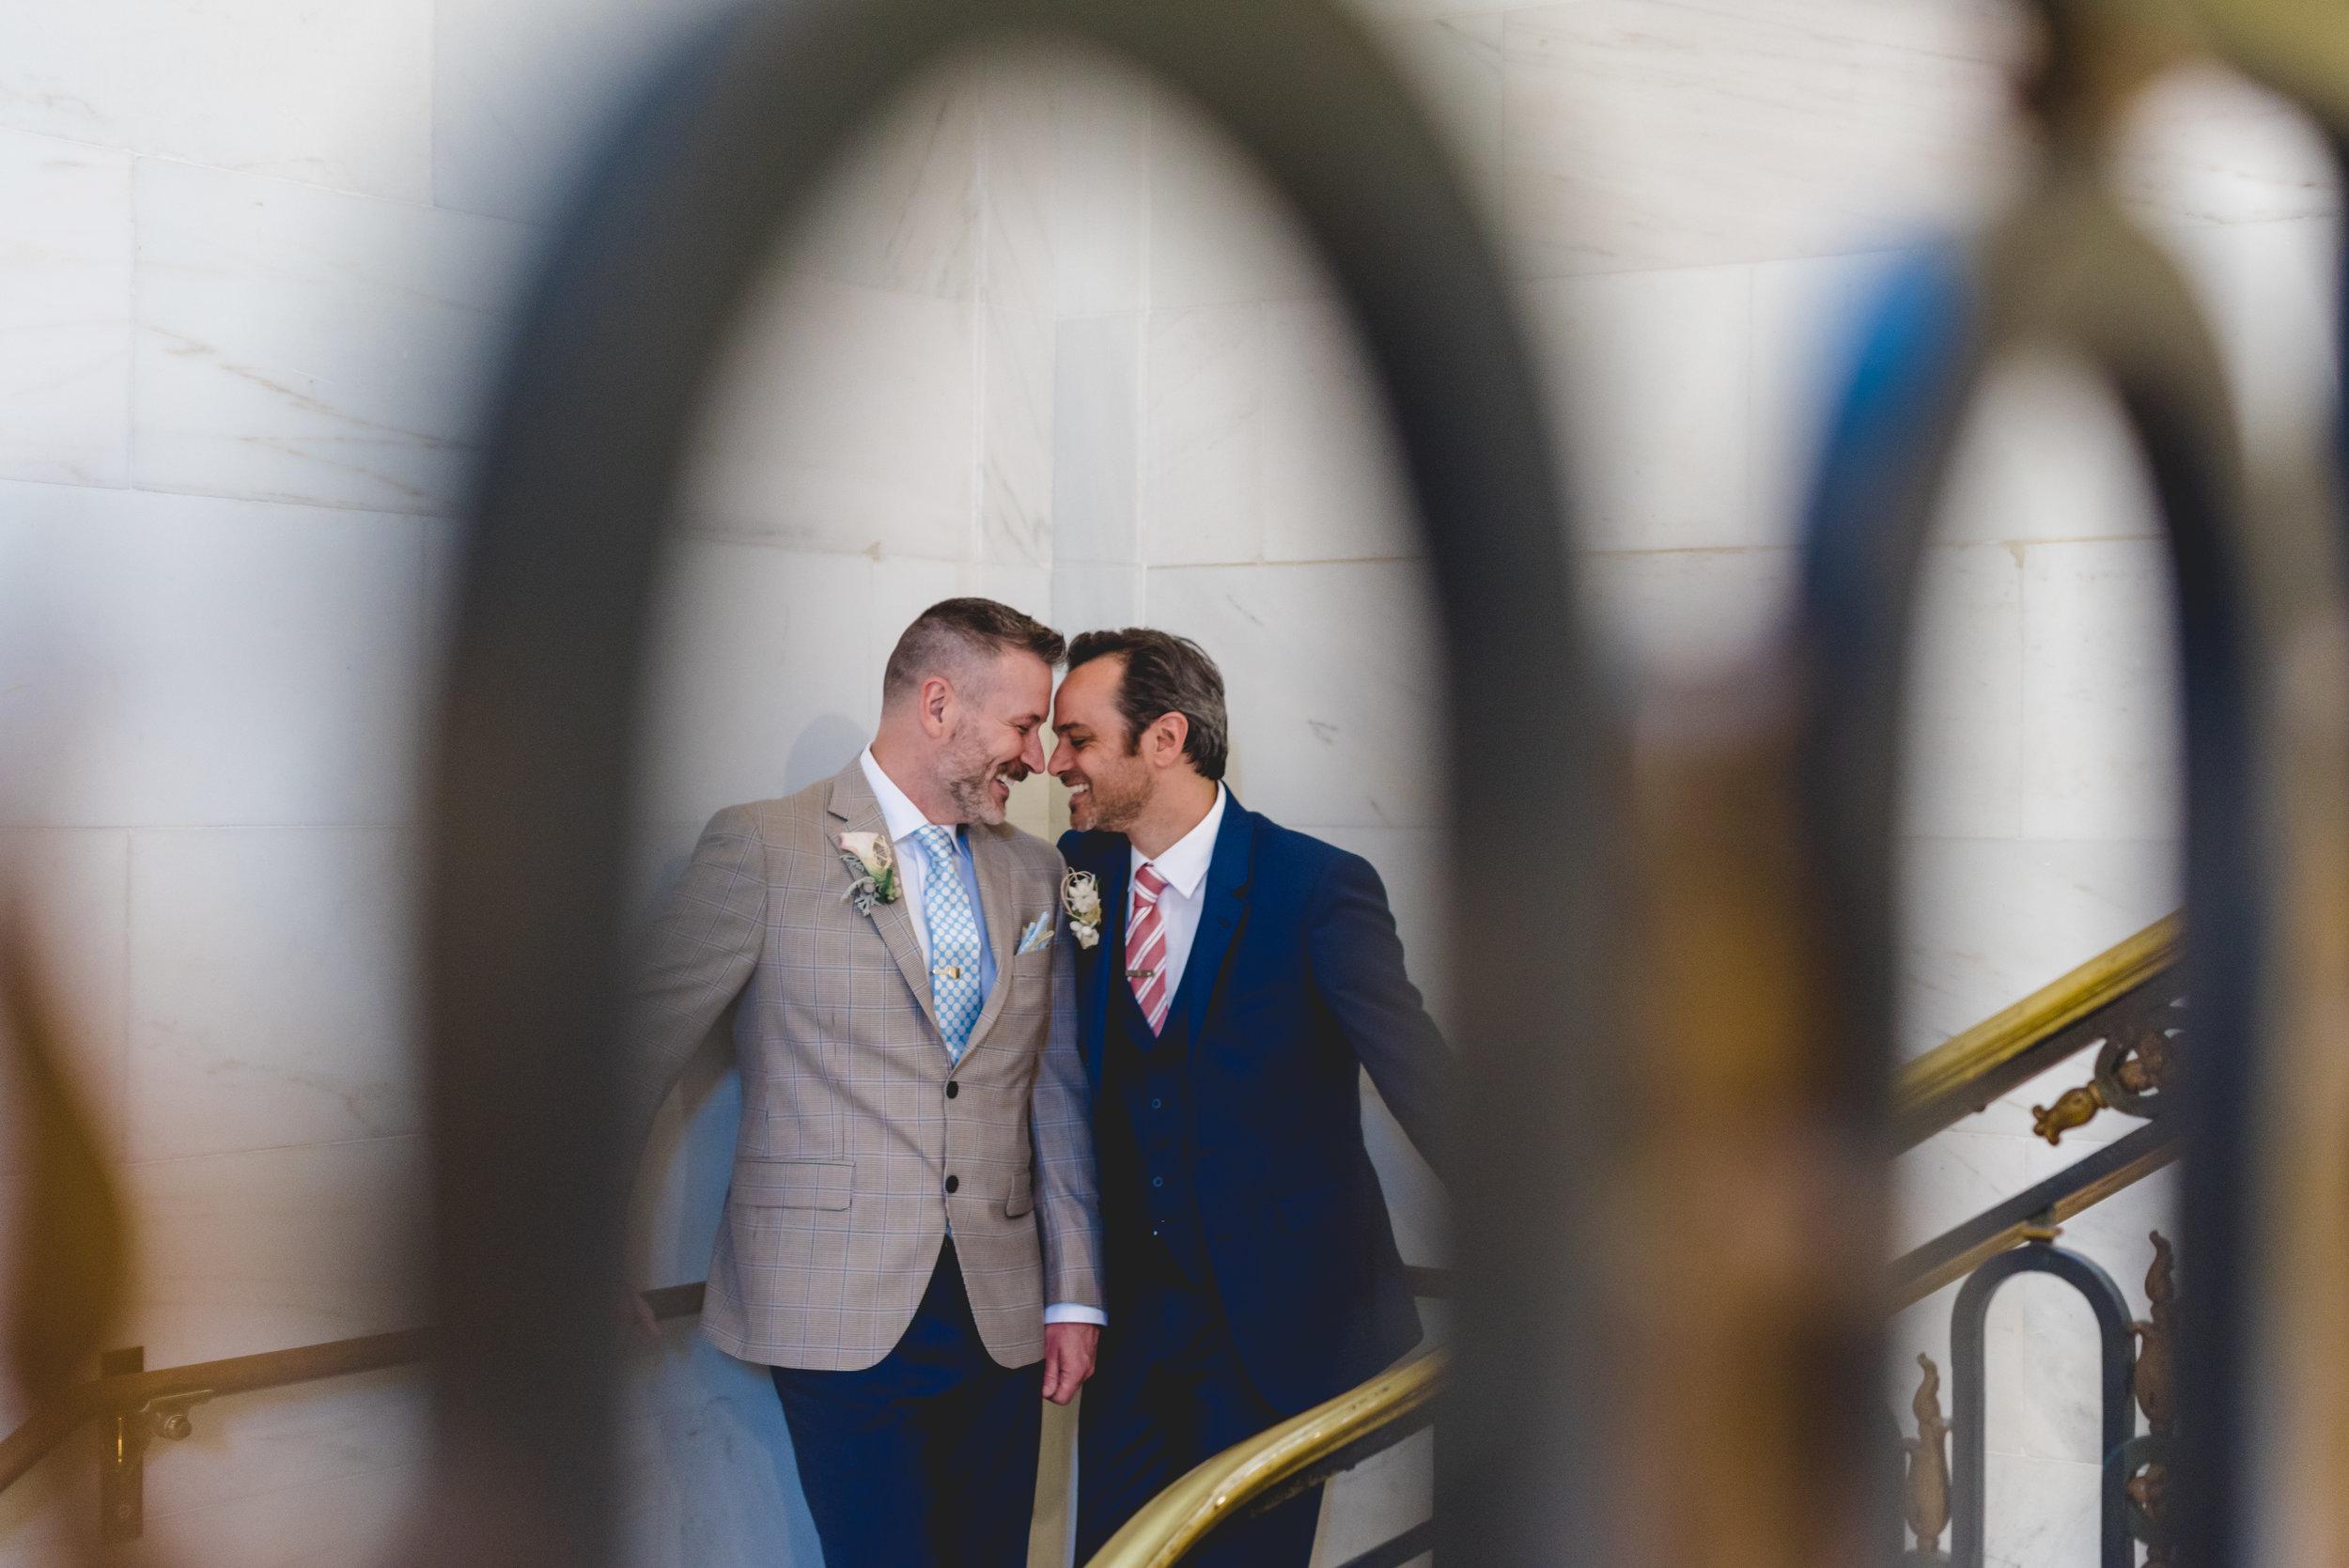 luke-and-brian-city-hall-wedding-35.jpg